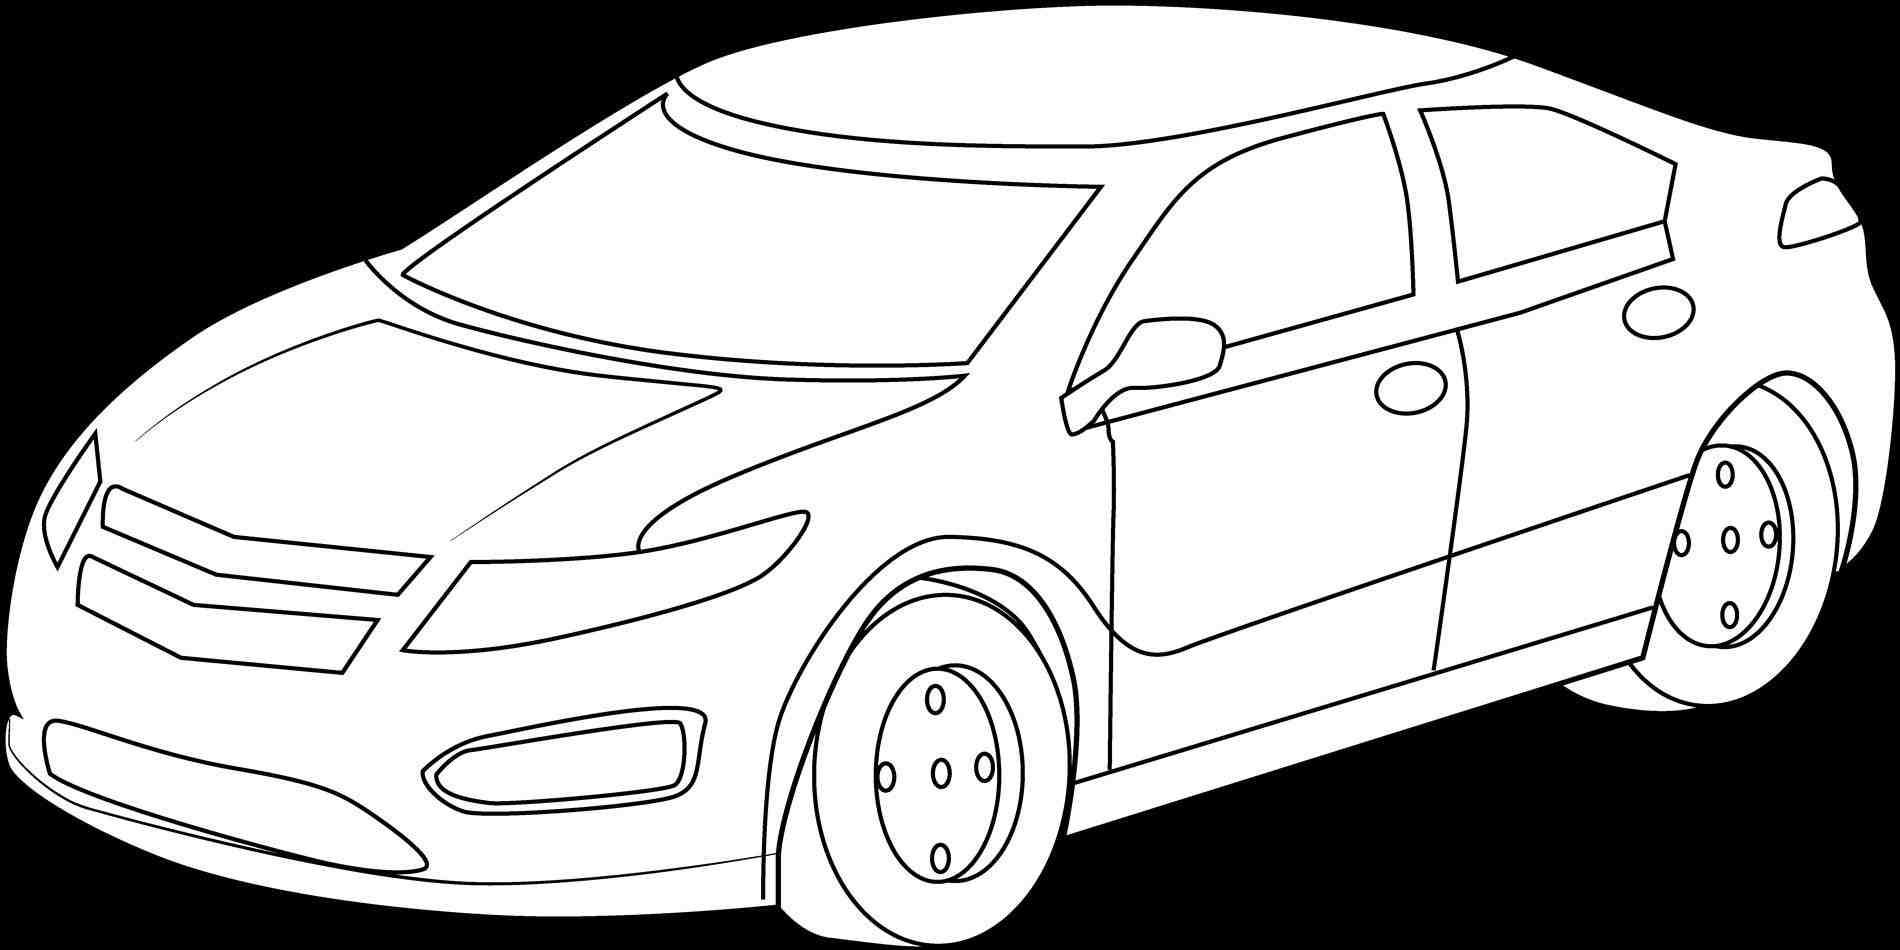 1900x950 Drawings Of Race Cars